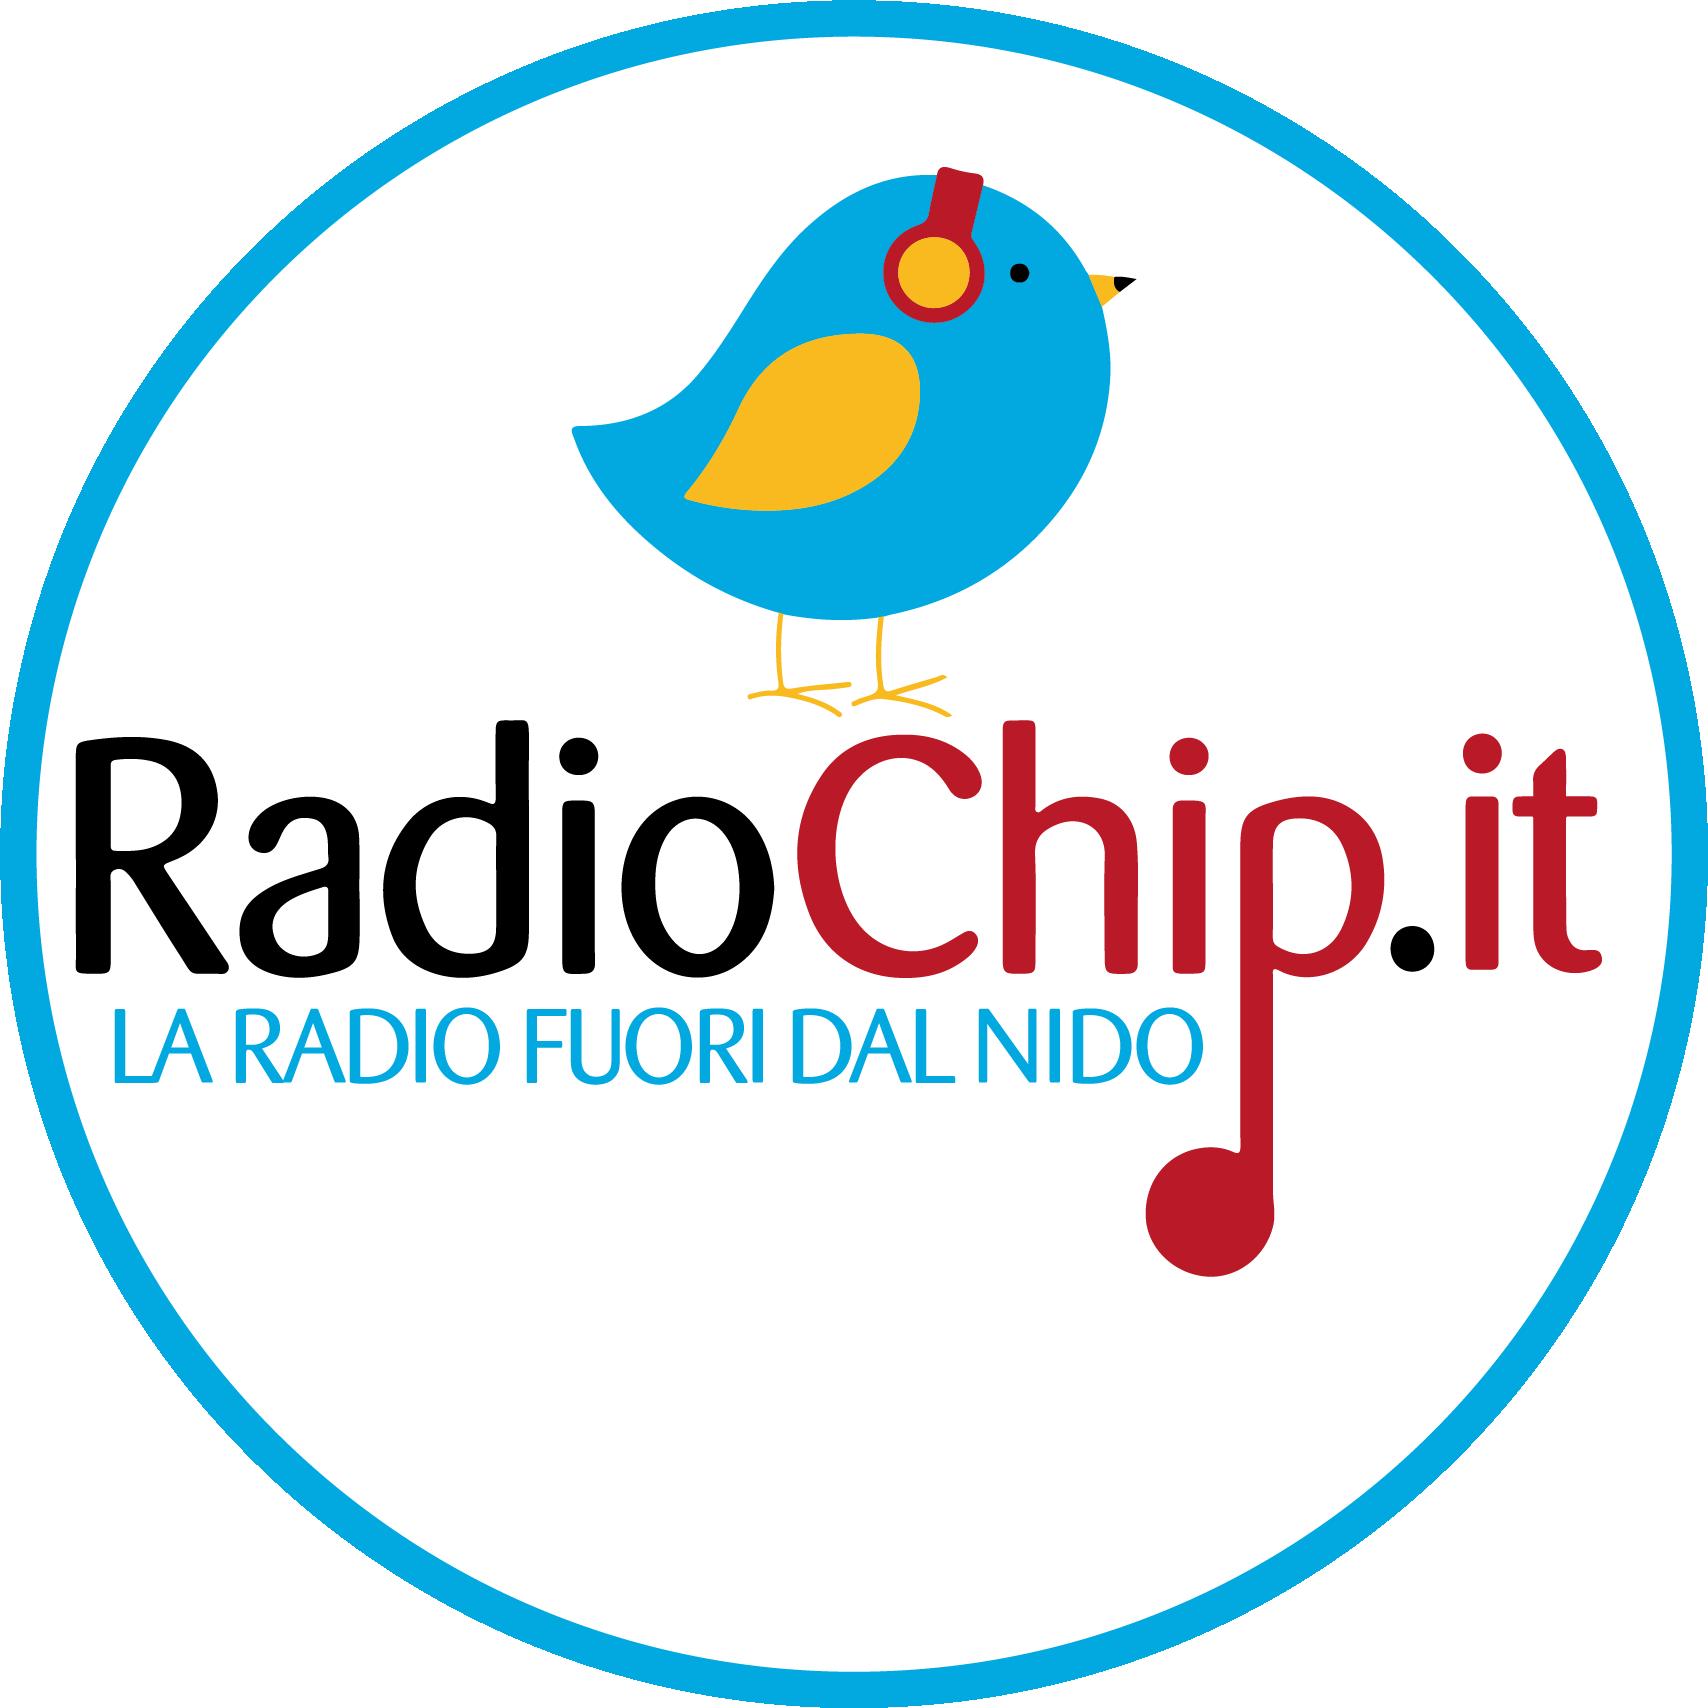 Radiochip.it